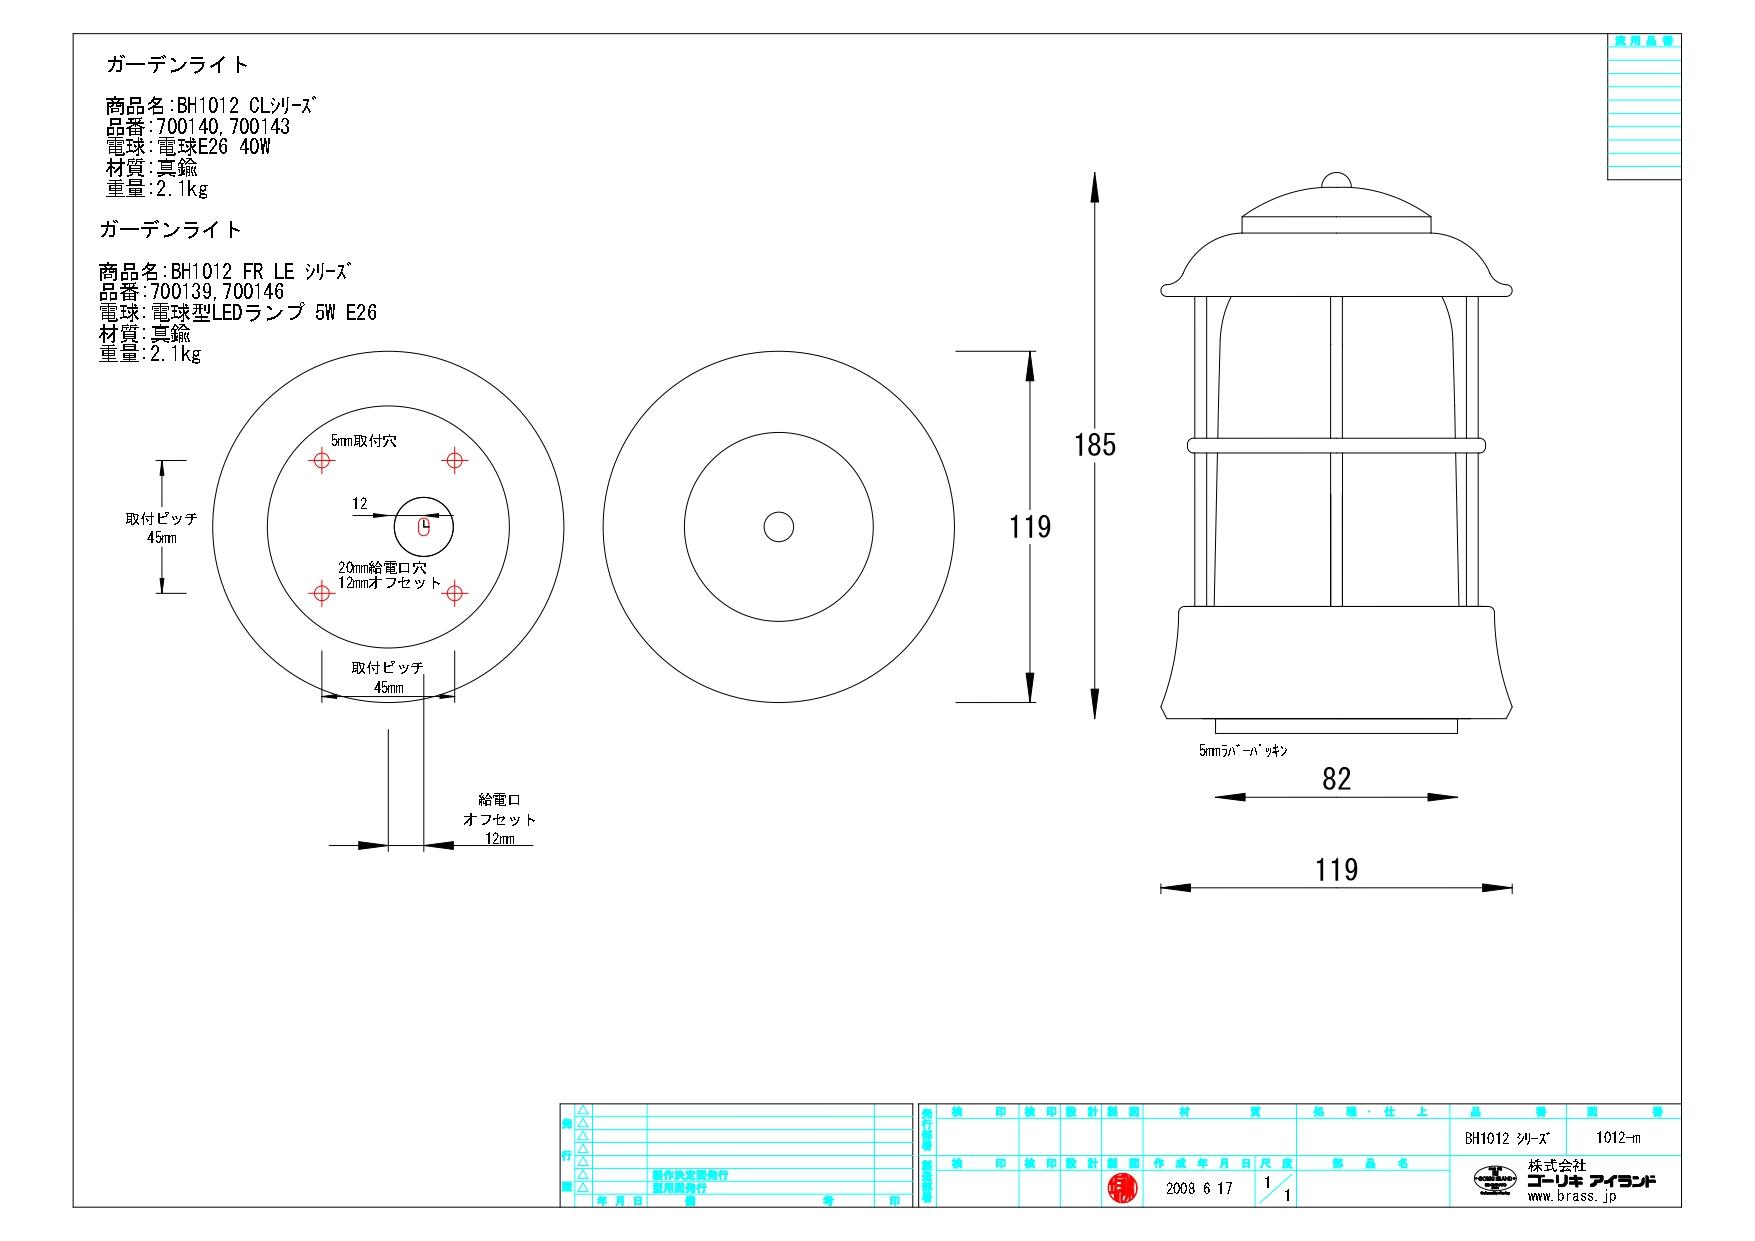 BH1012AN 施工説明書_page-0002